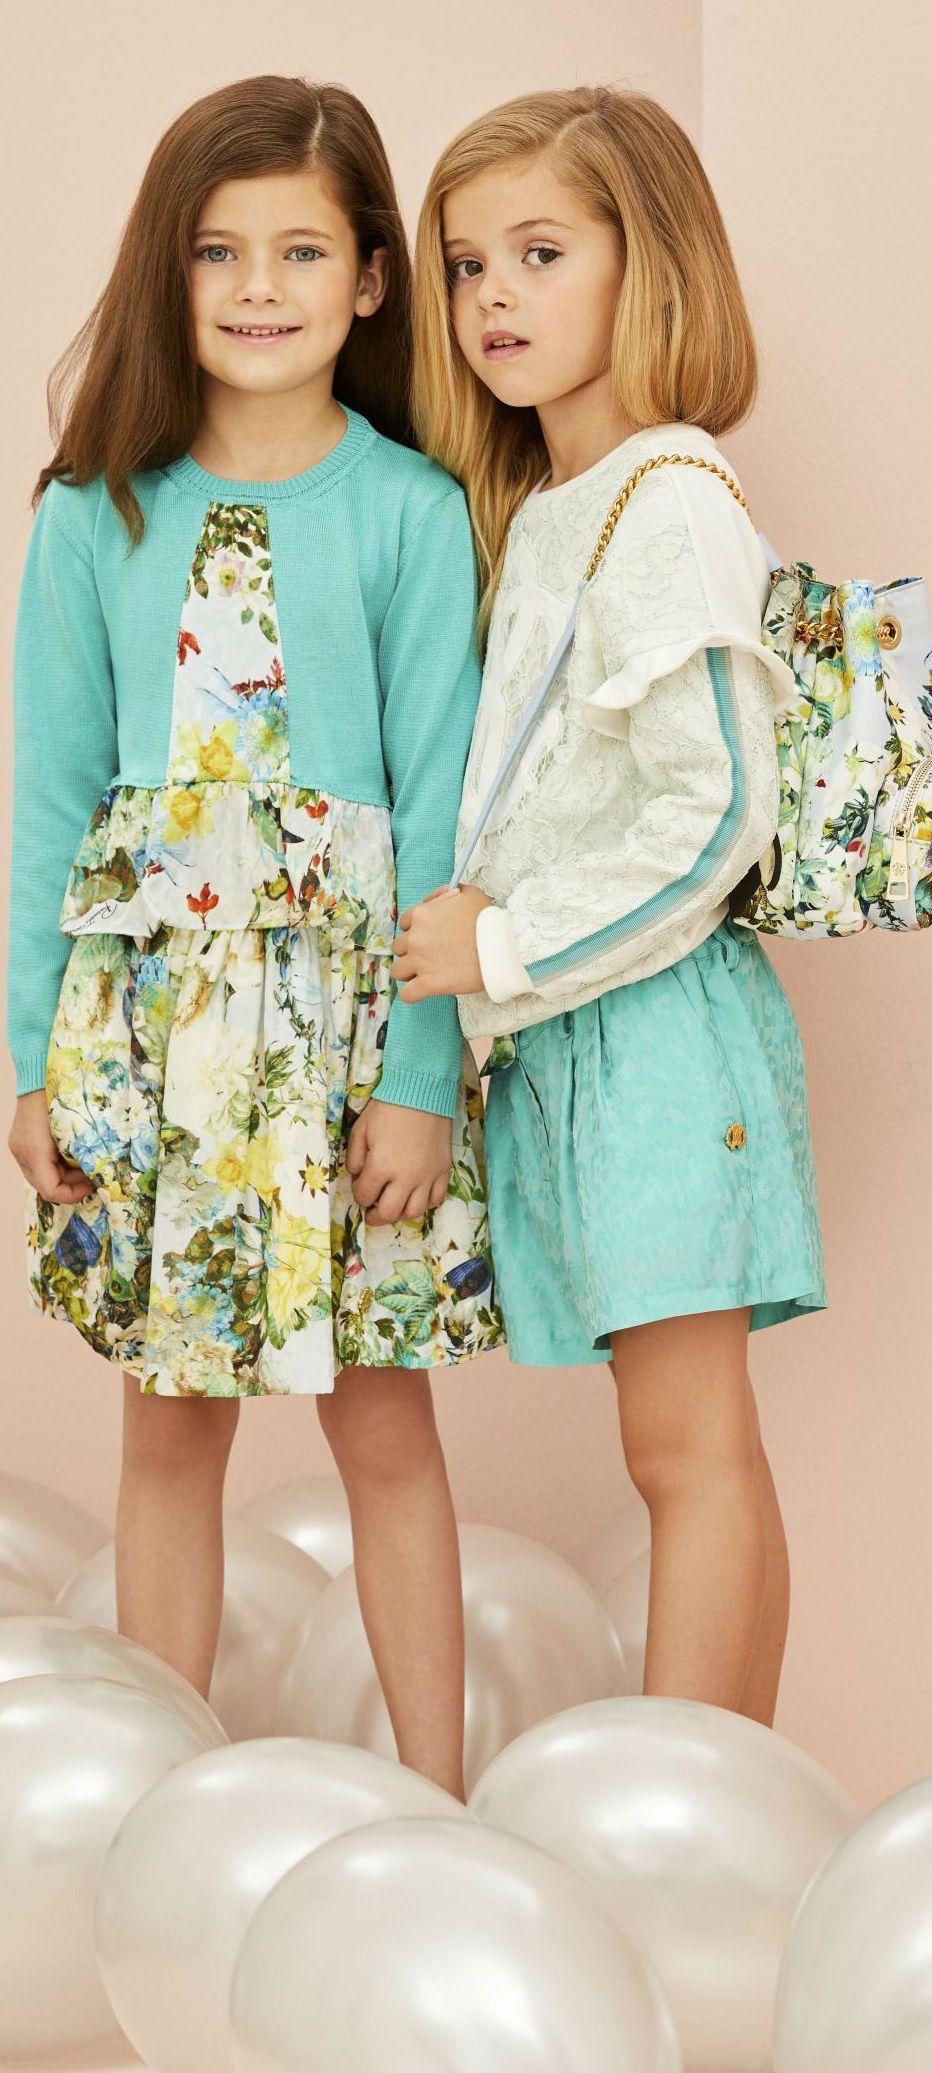 a04b1b3109 Roberto Cavalli Junior Girls Blue Floral Print Dress Summer 2018.   kidsfashion  style  fashion  kids  girl  robertocavalli  summer